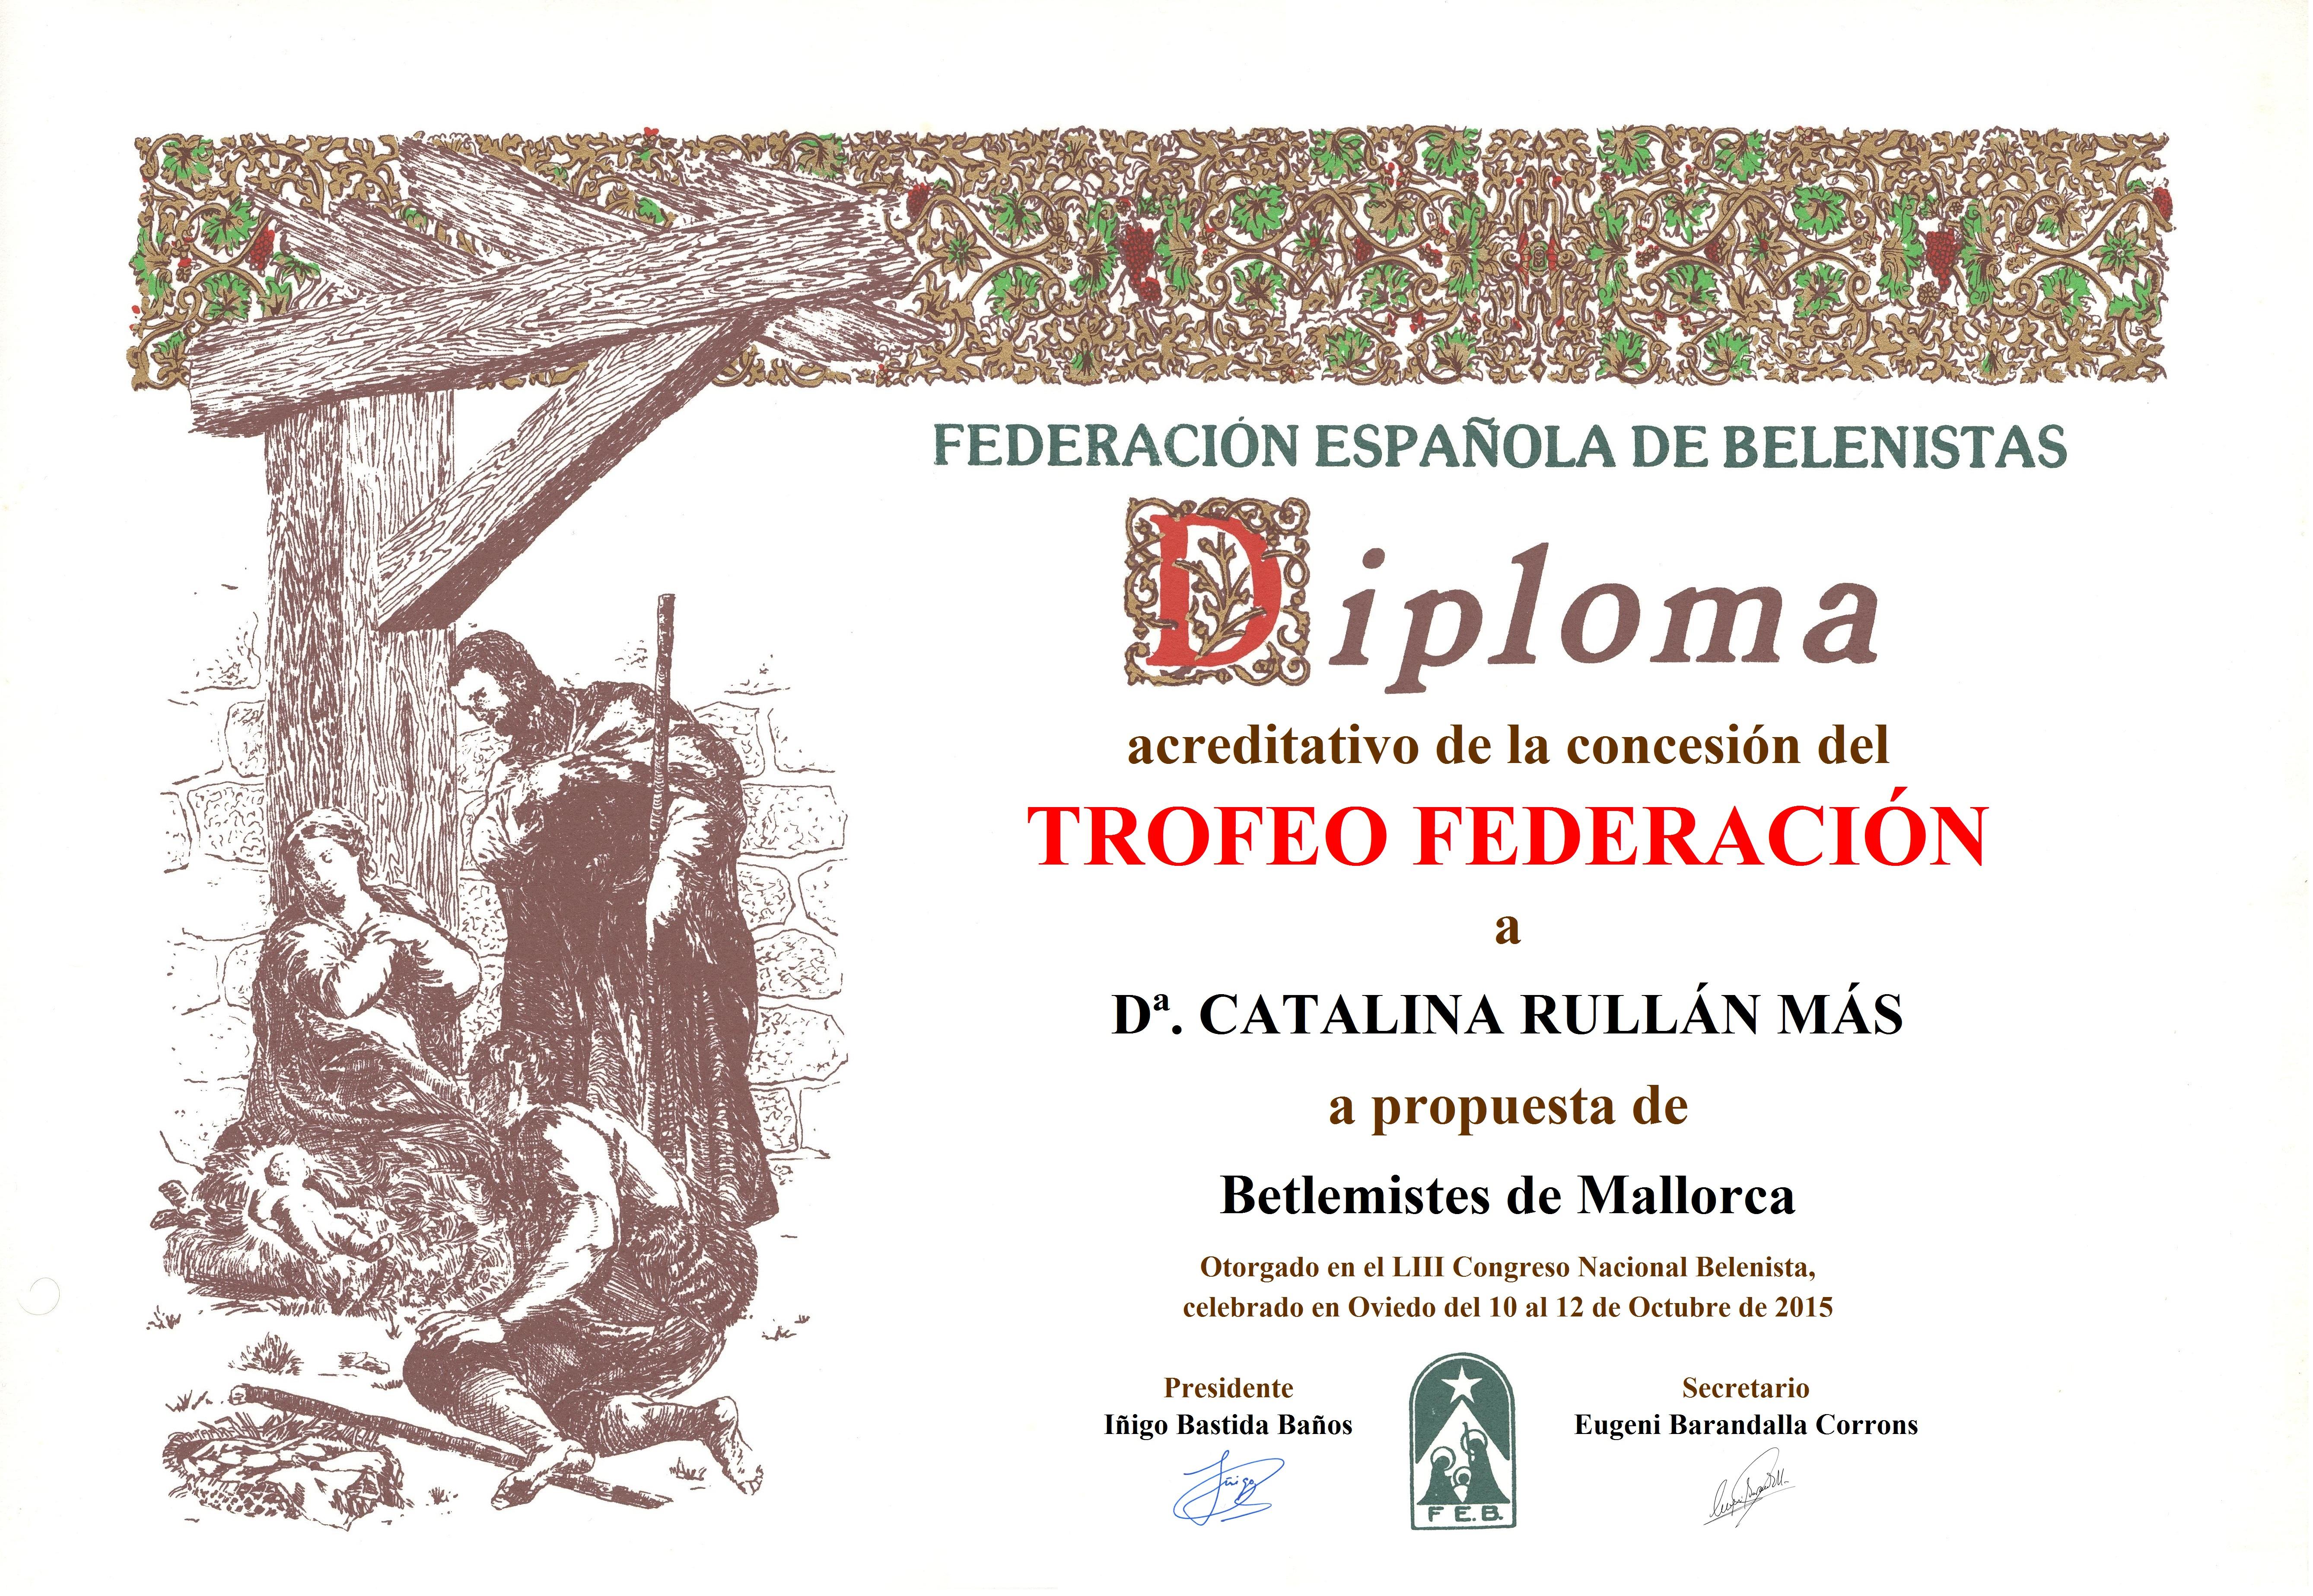 Diploma Trofeo FEB 2015 Catalina Rullán Más